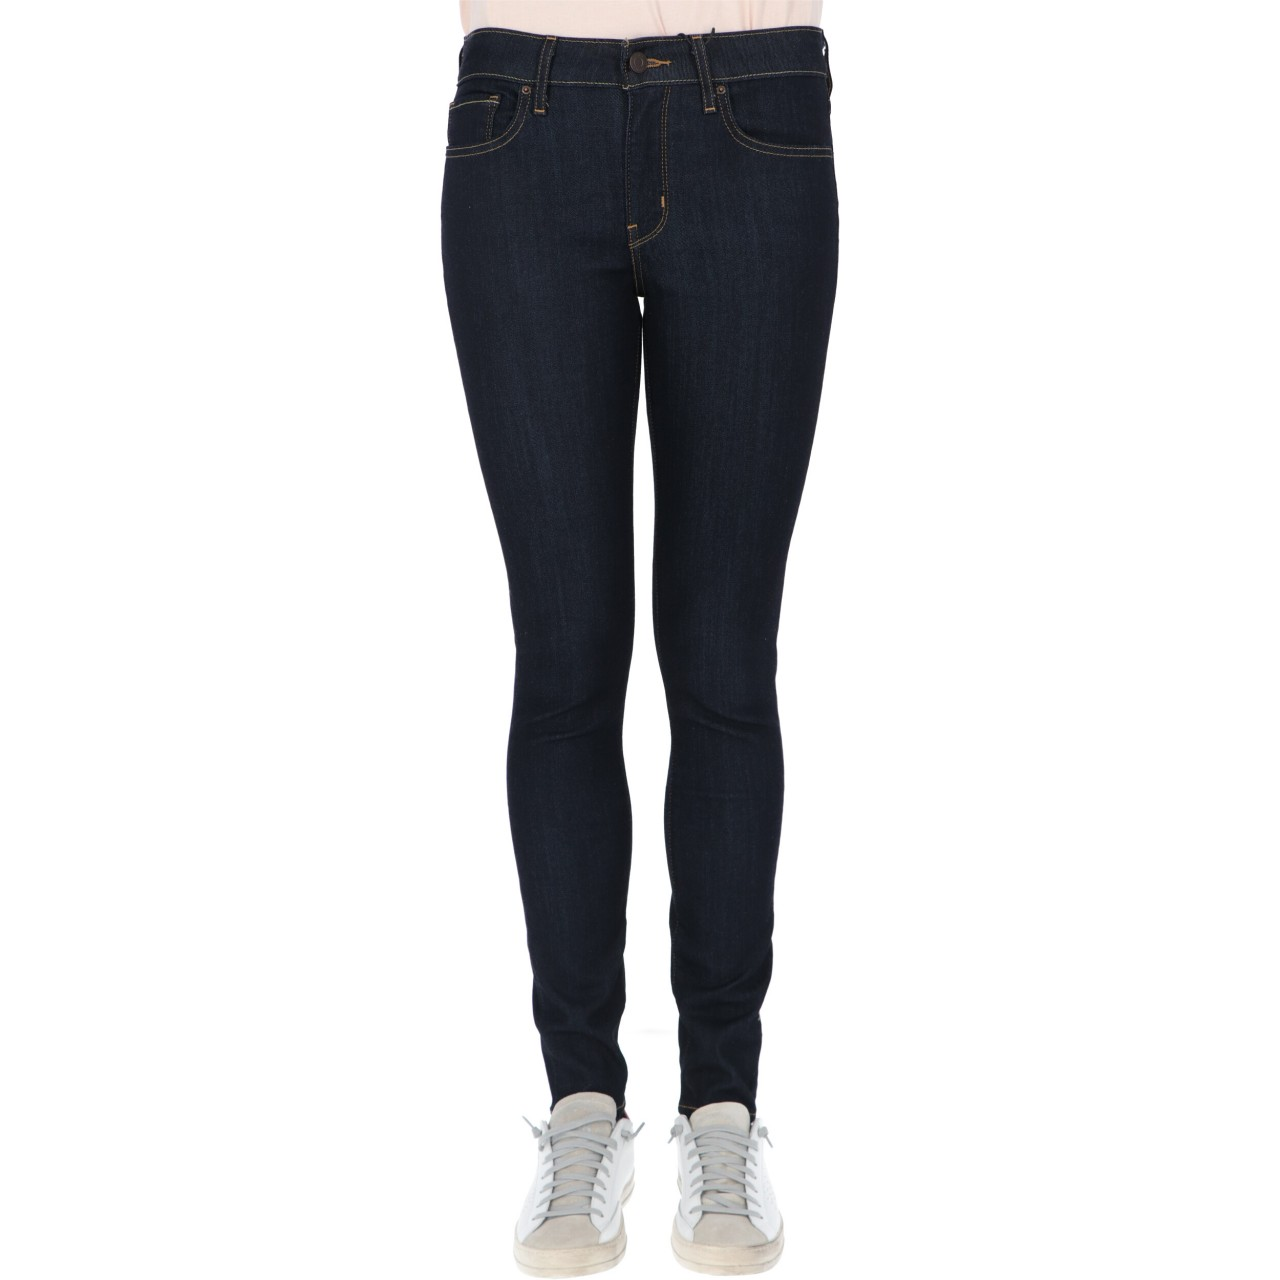 Levi's Donna Jeans Levi's Donna 711 Skinny To The Nine L30 8810352P